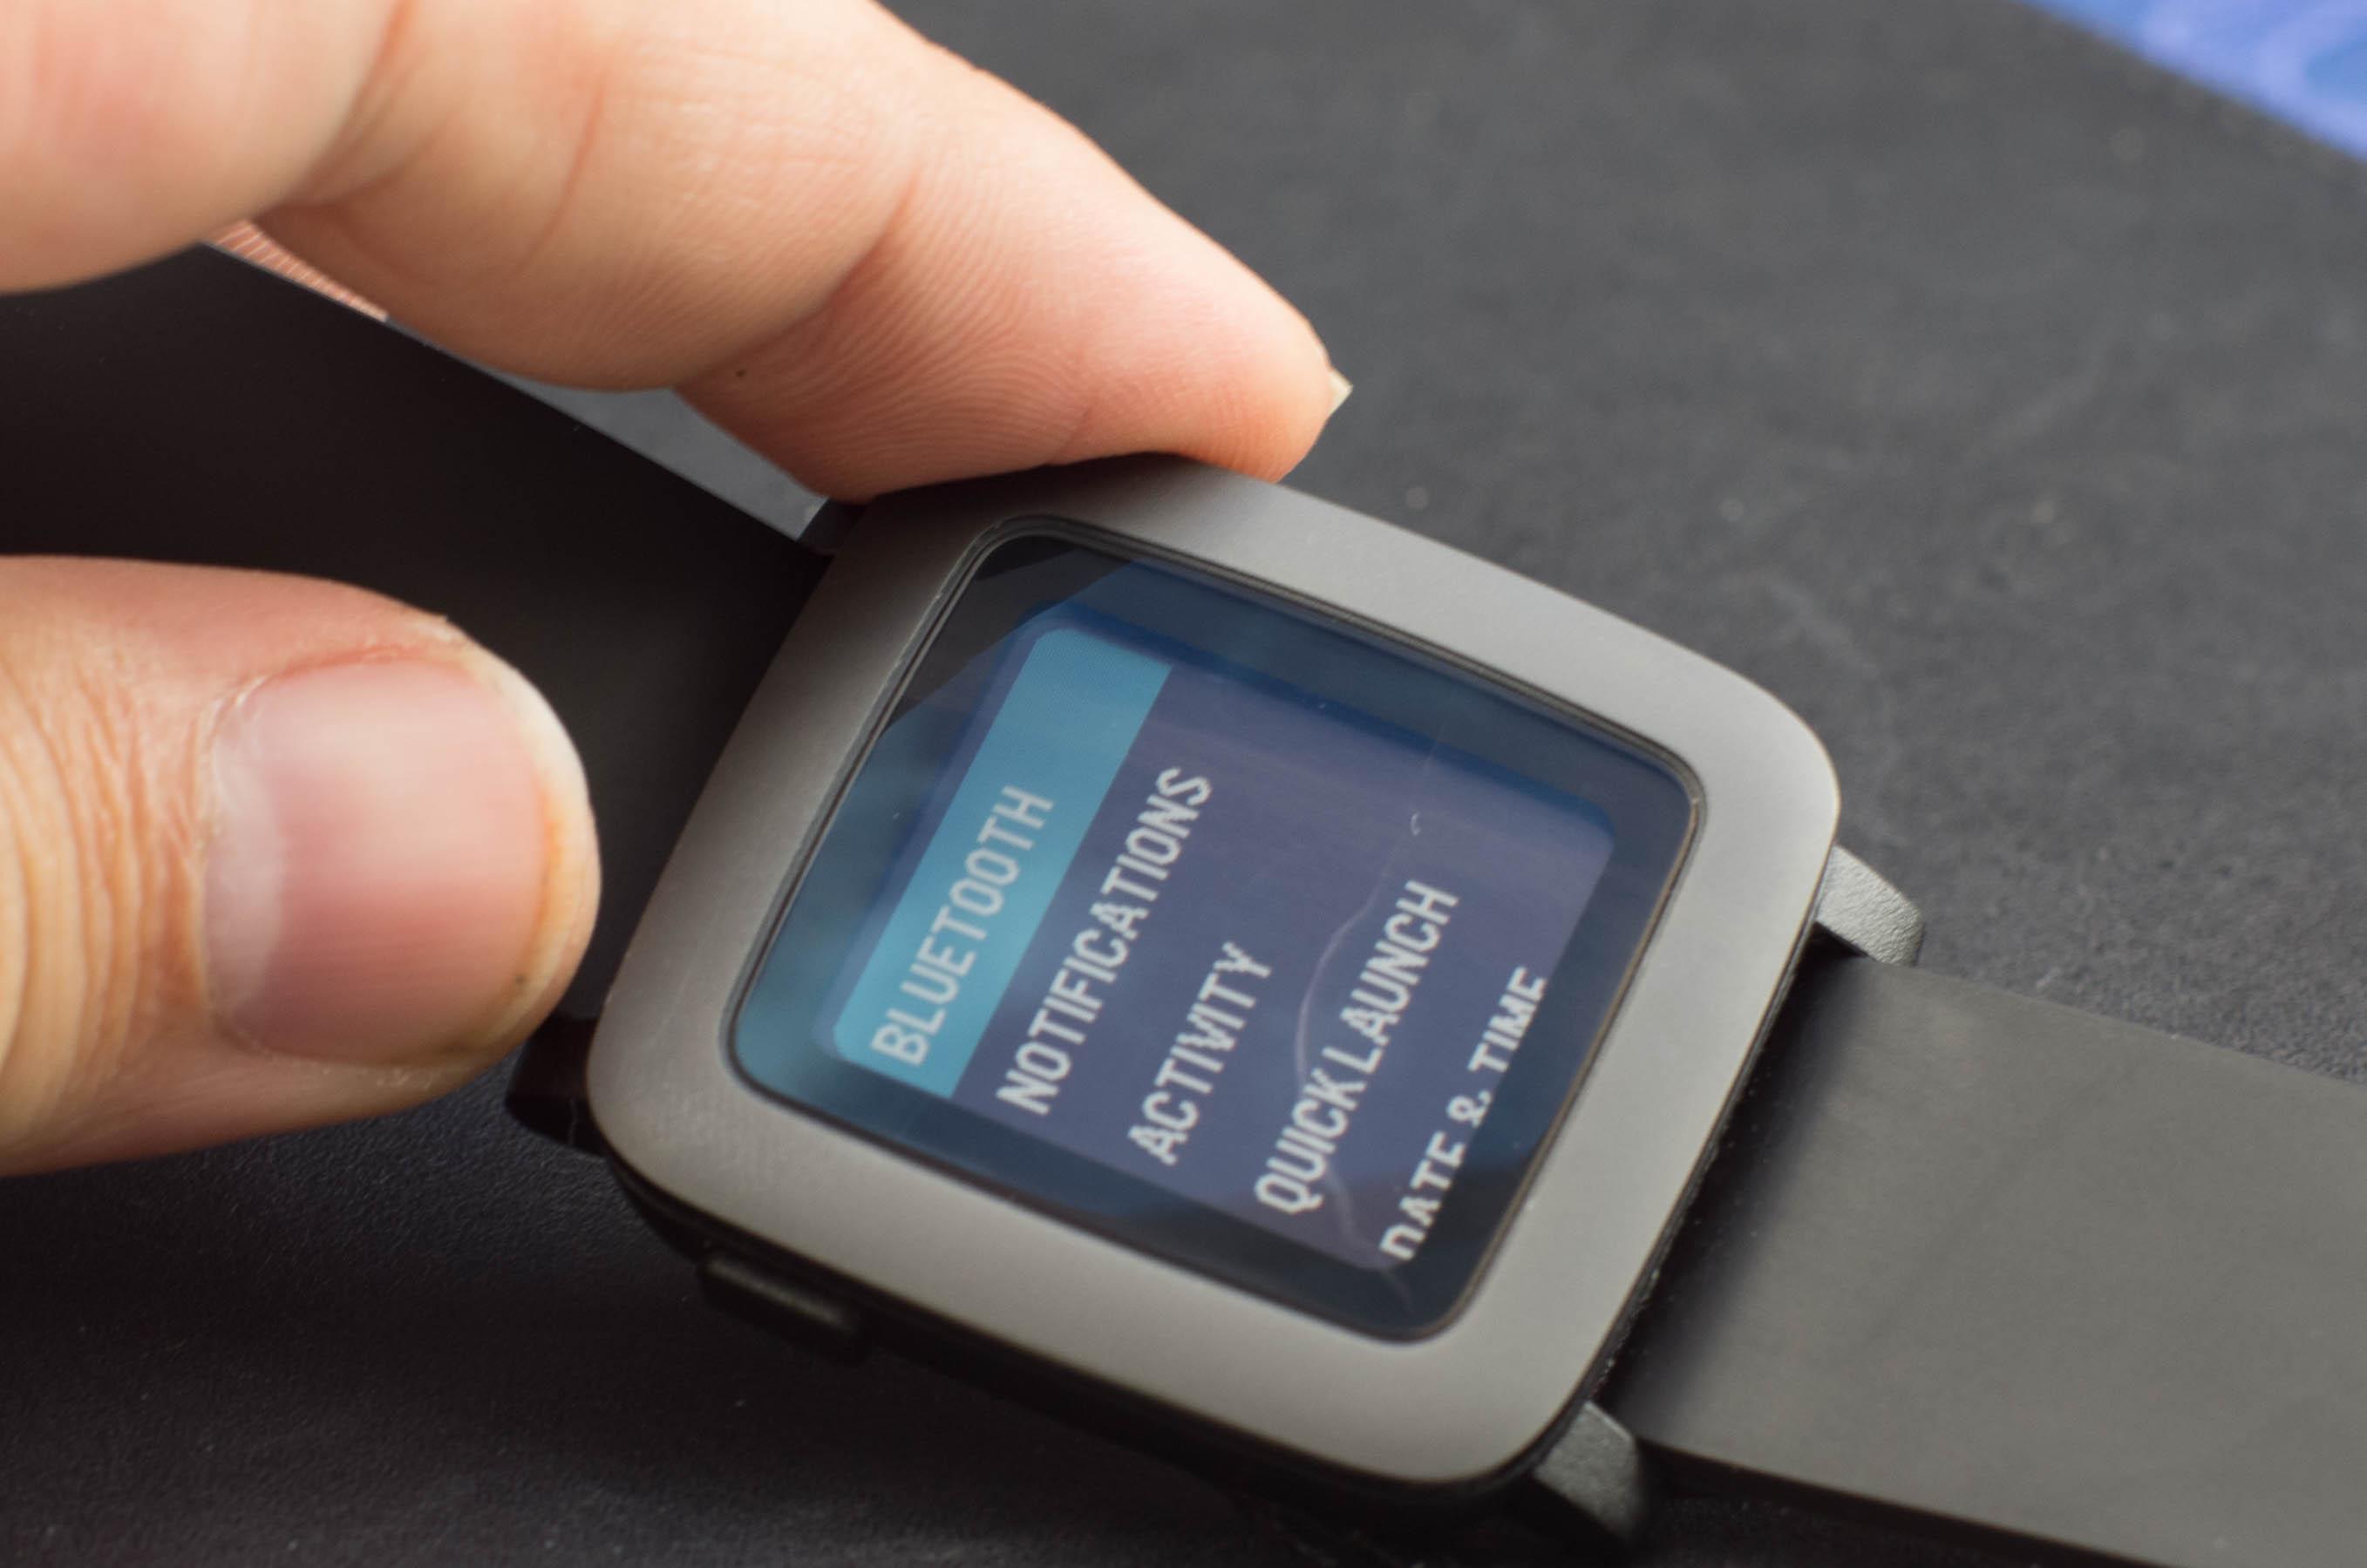 Pebble Time im Test: Nicht besonders smart, aber watch - Pebble Time (Bild: Andreas Donath)